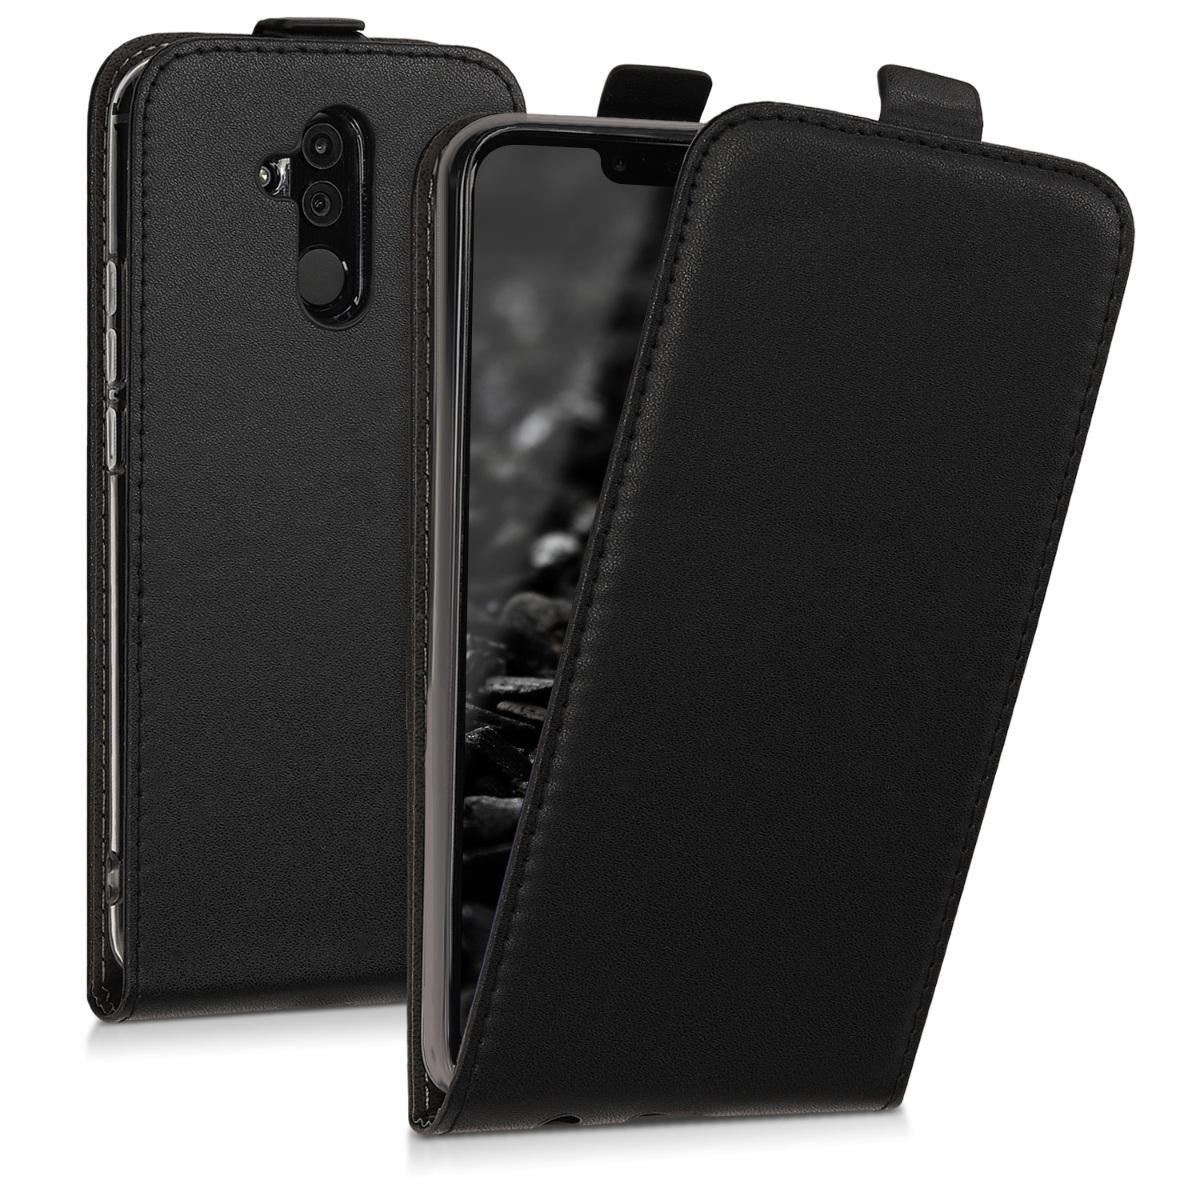 KW Flip Θήκη Huawei Mate 20 Lite - Black (46710.01)